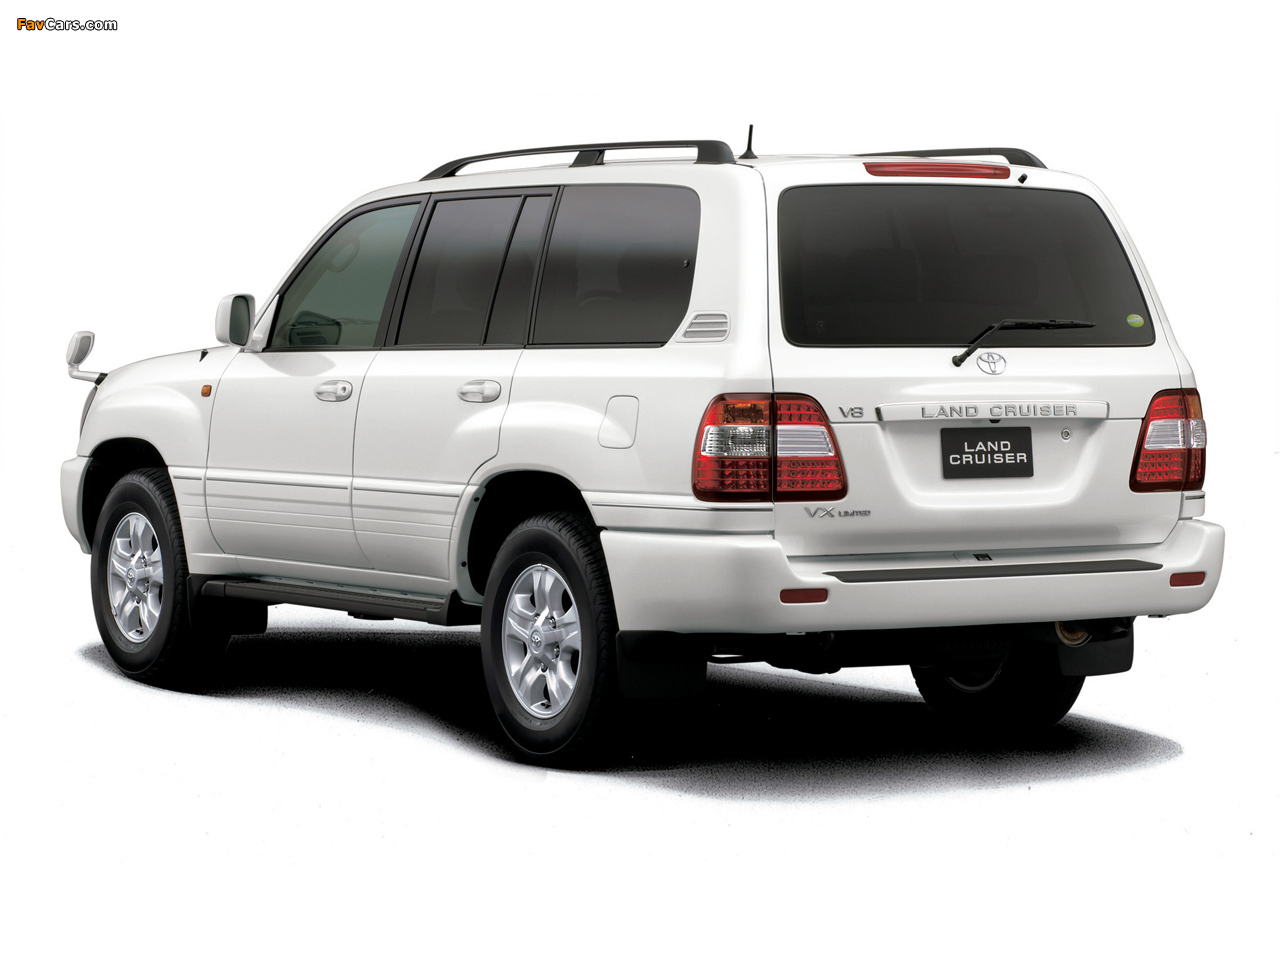 Kelebihan Kekurangan Toyota Land Cruiser 2005 Spesifikasi